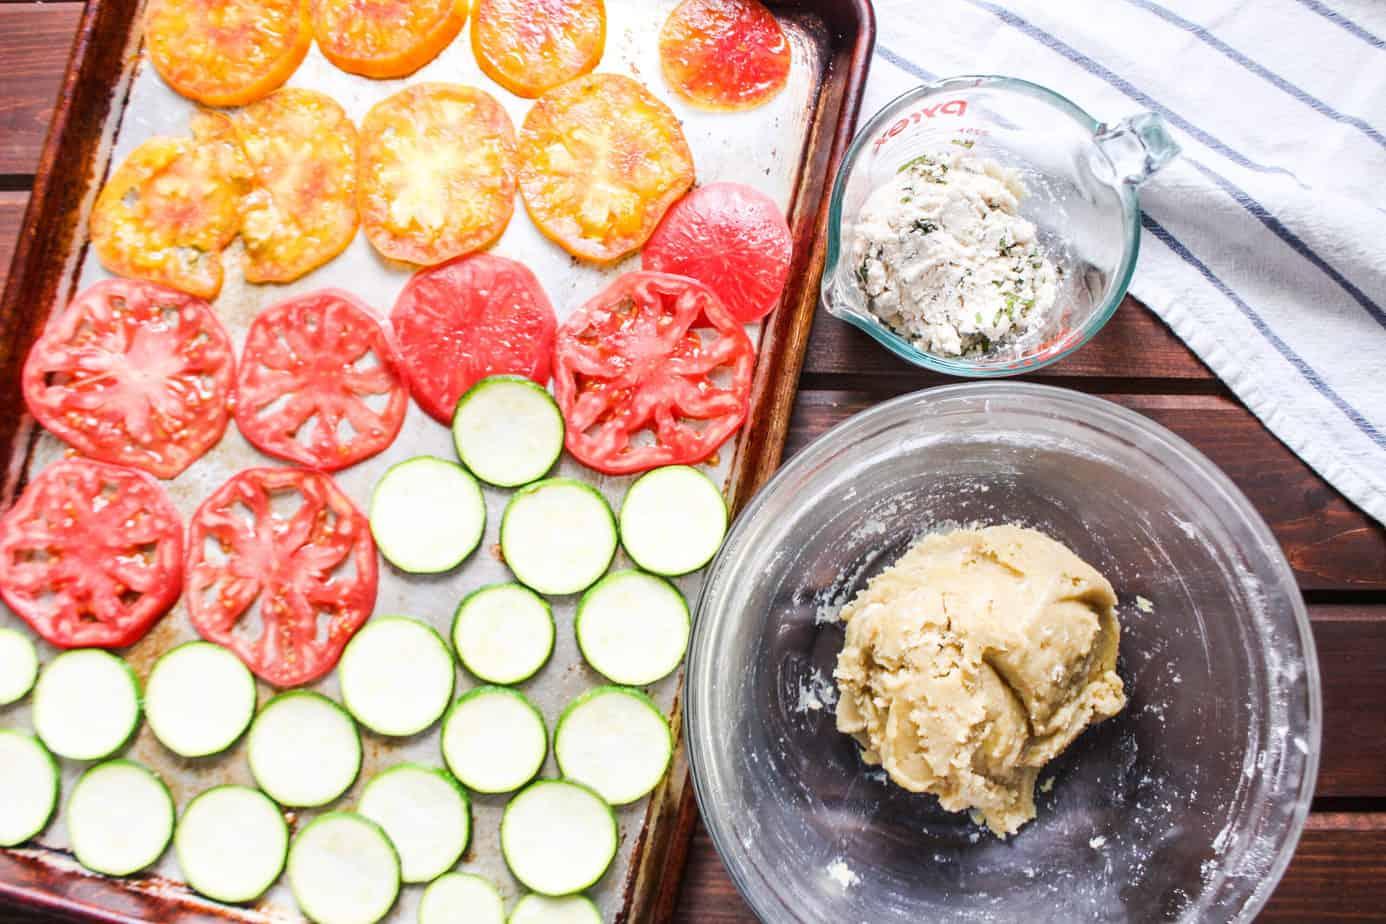 ingredients for zucchini summer galette